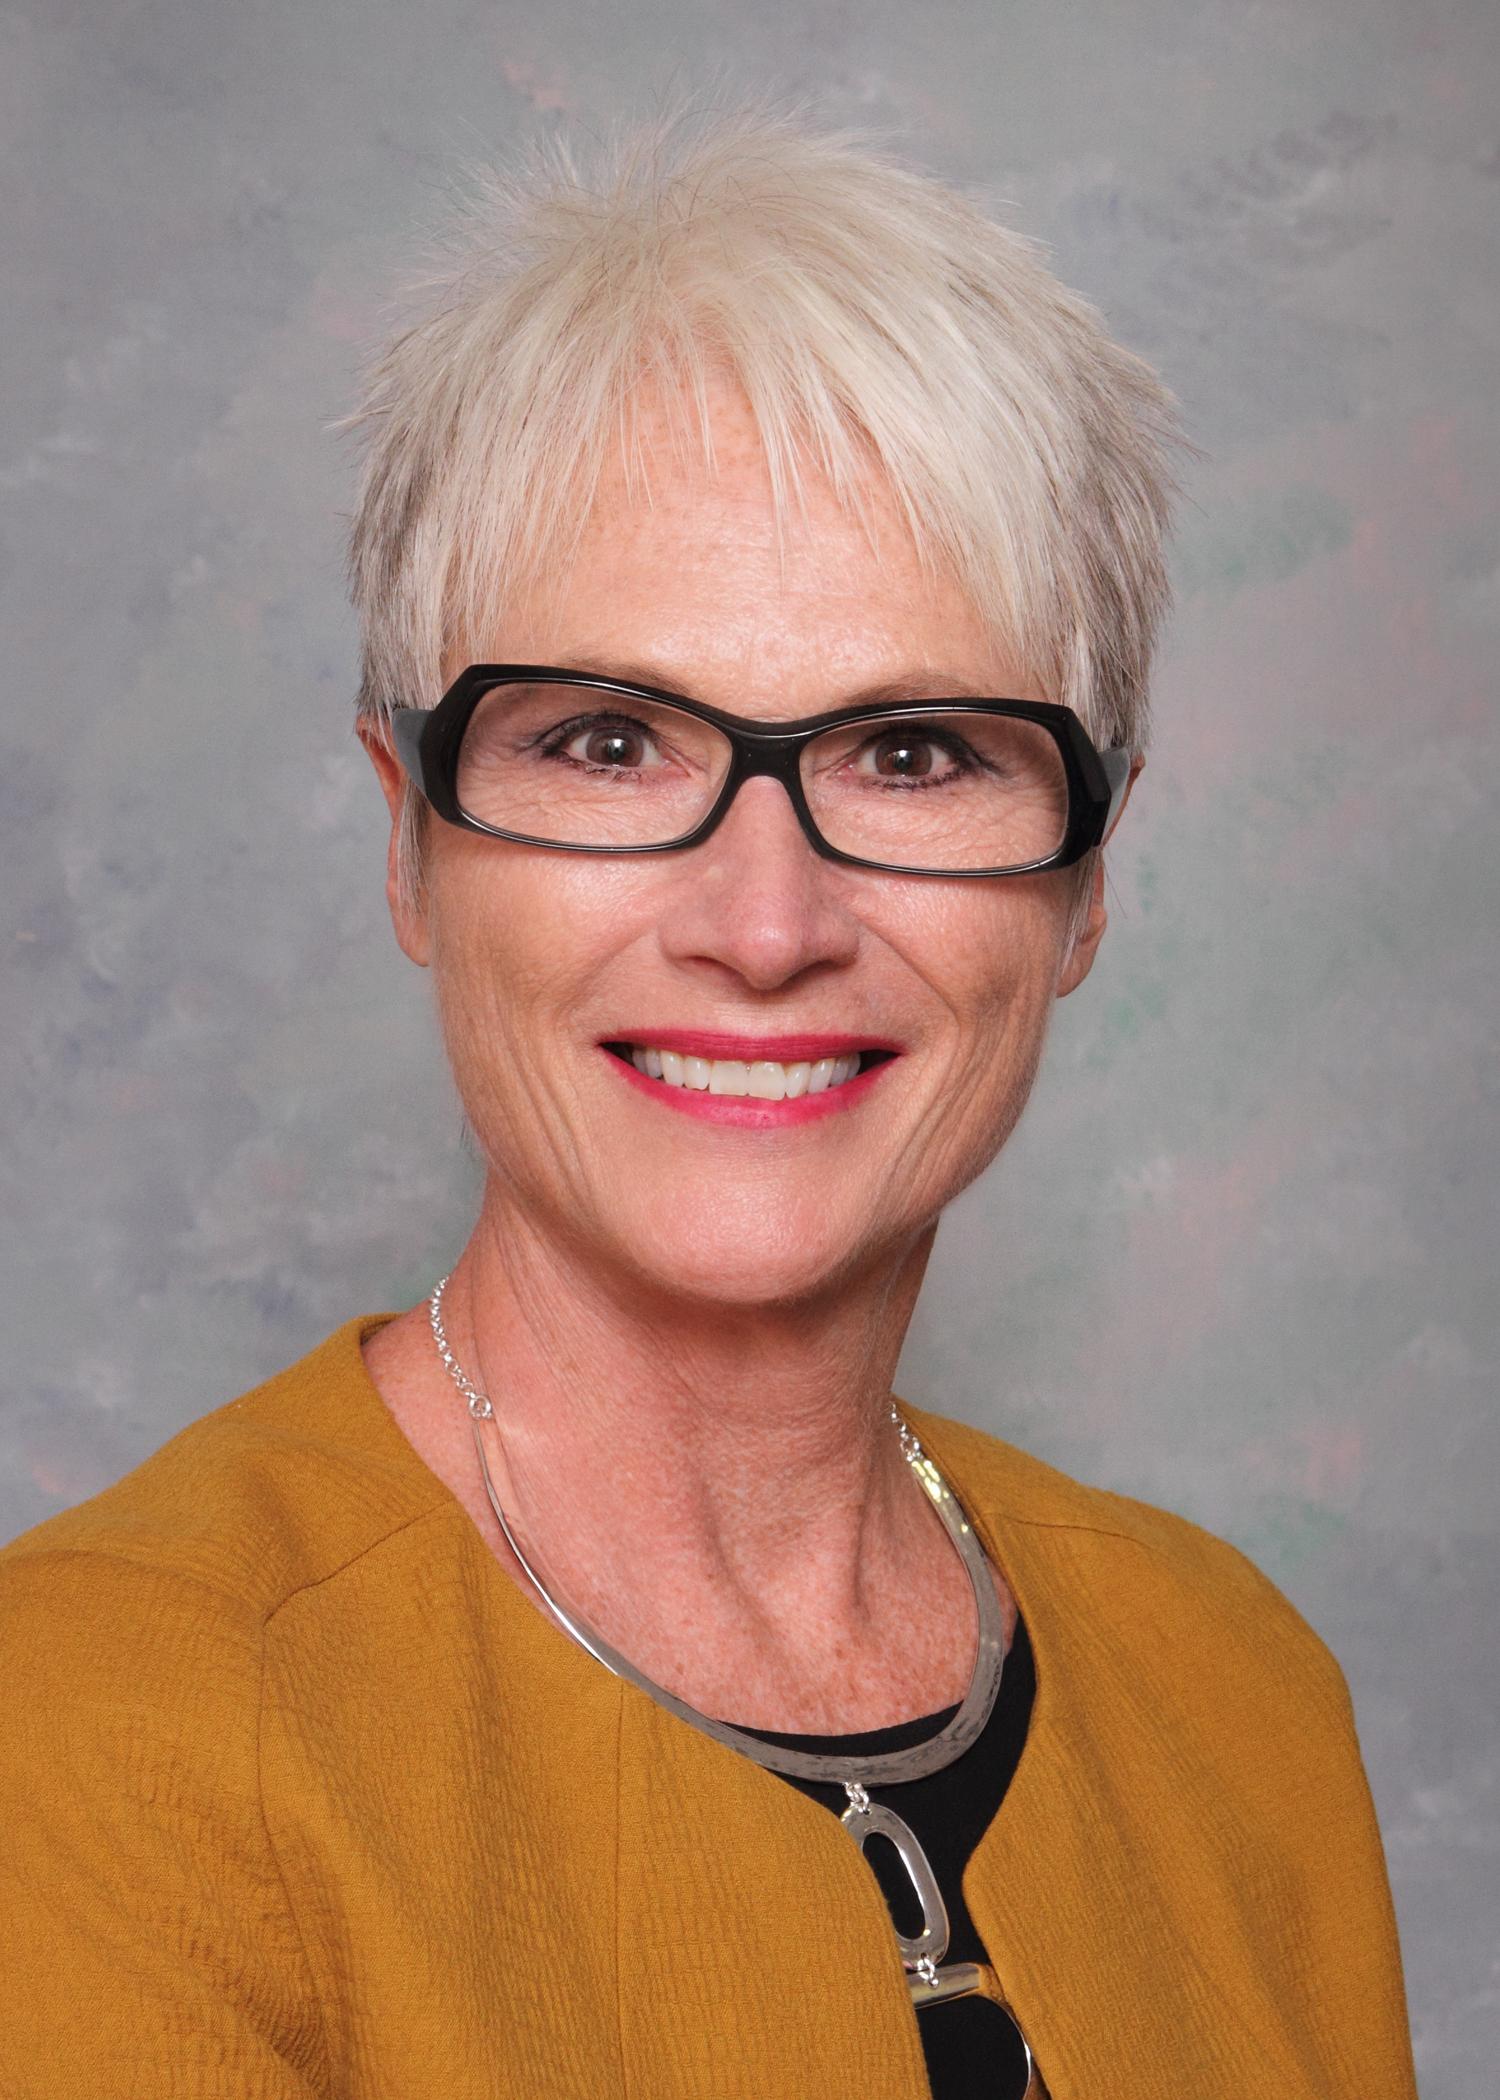 Mary K. Brawley, M.A., CCC-SLP, BCS-S